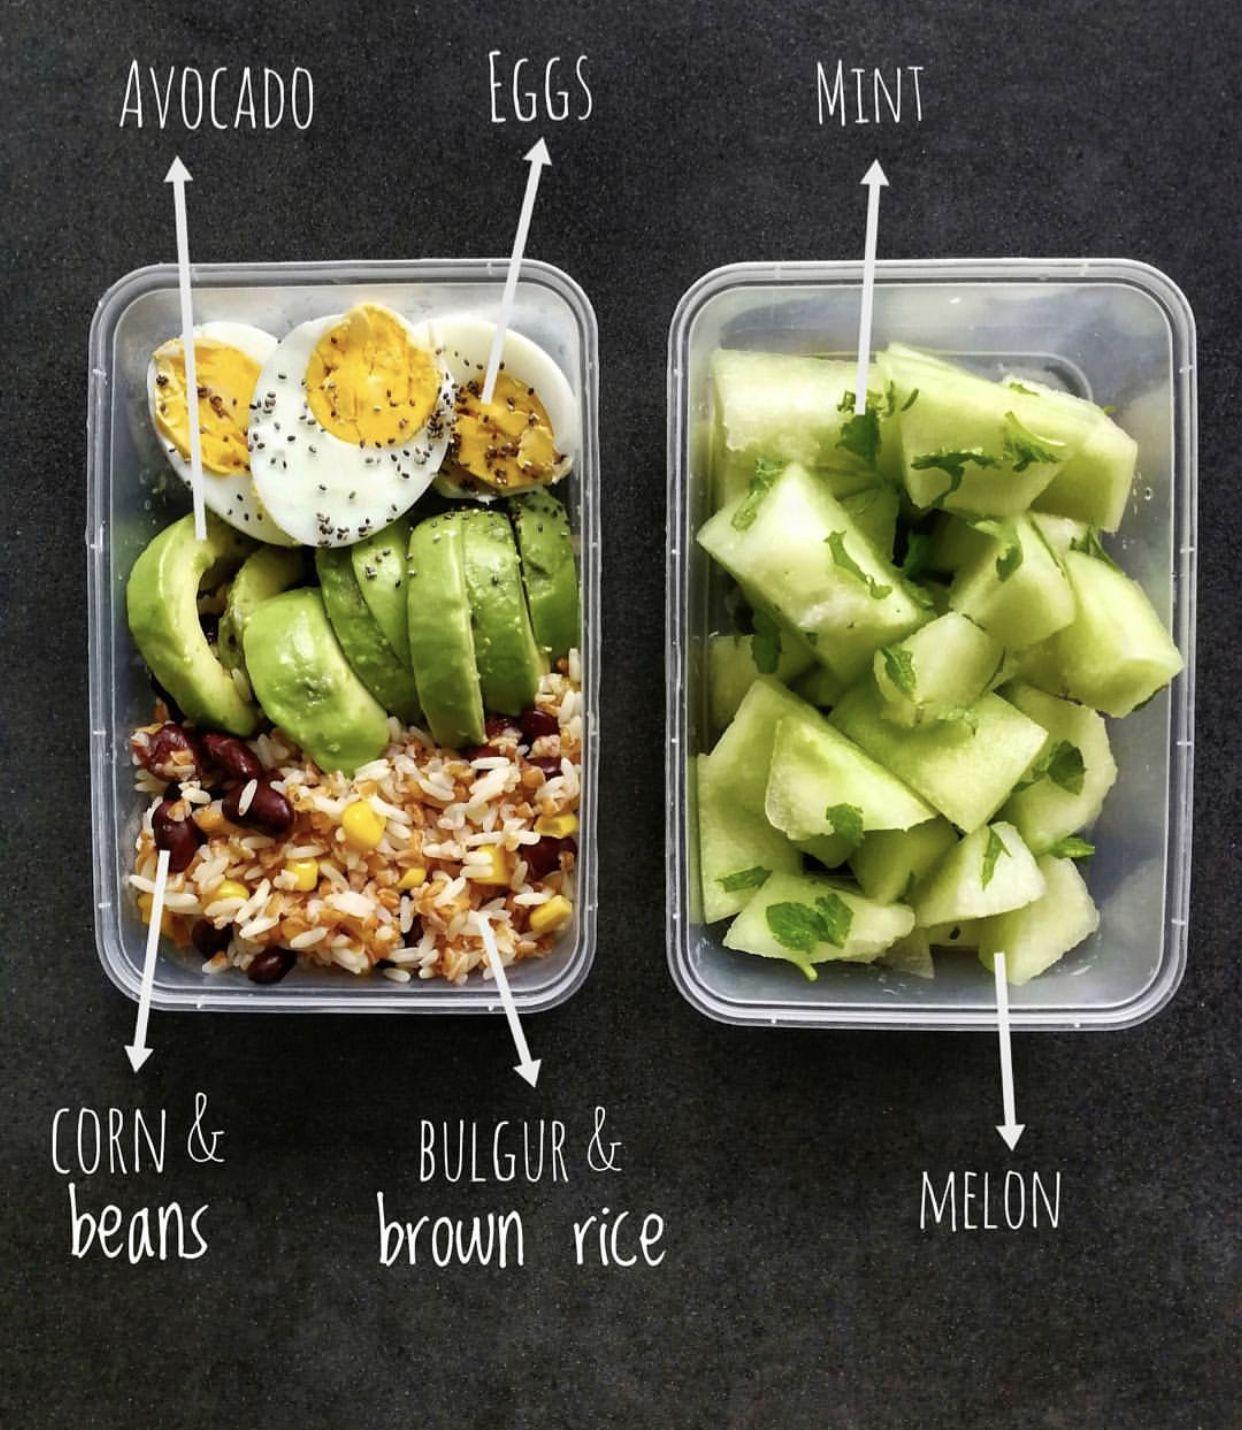 Bulgur Brown Rice Beans Avocado Egg Melon And Mint Healthy Meal Prep Food Healthy Recipes